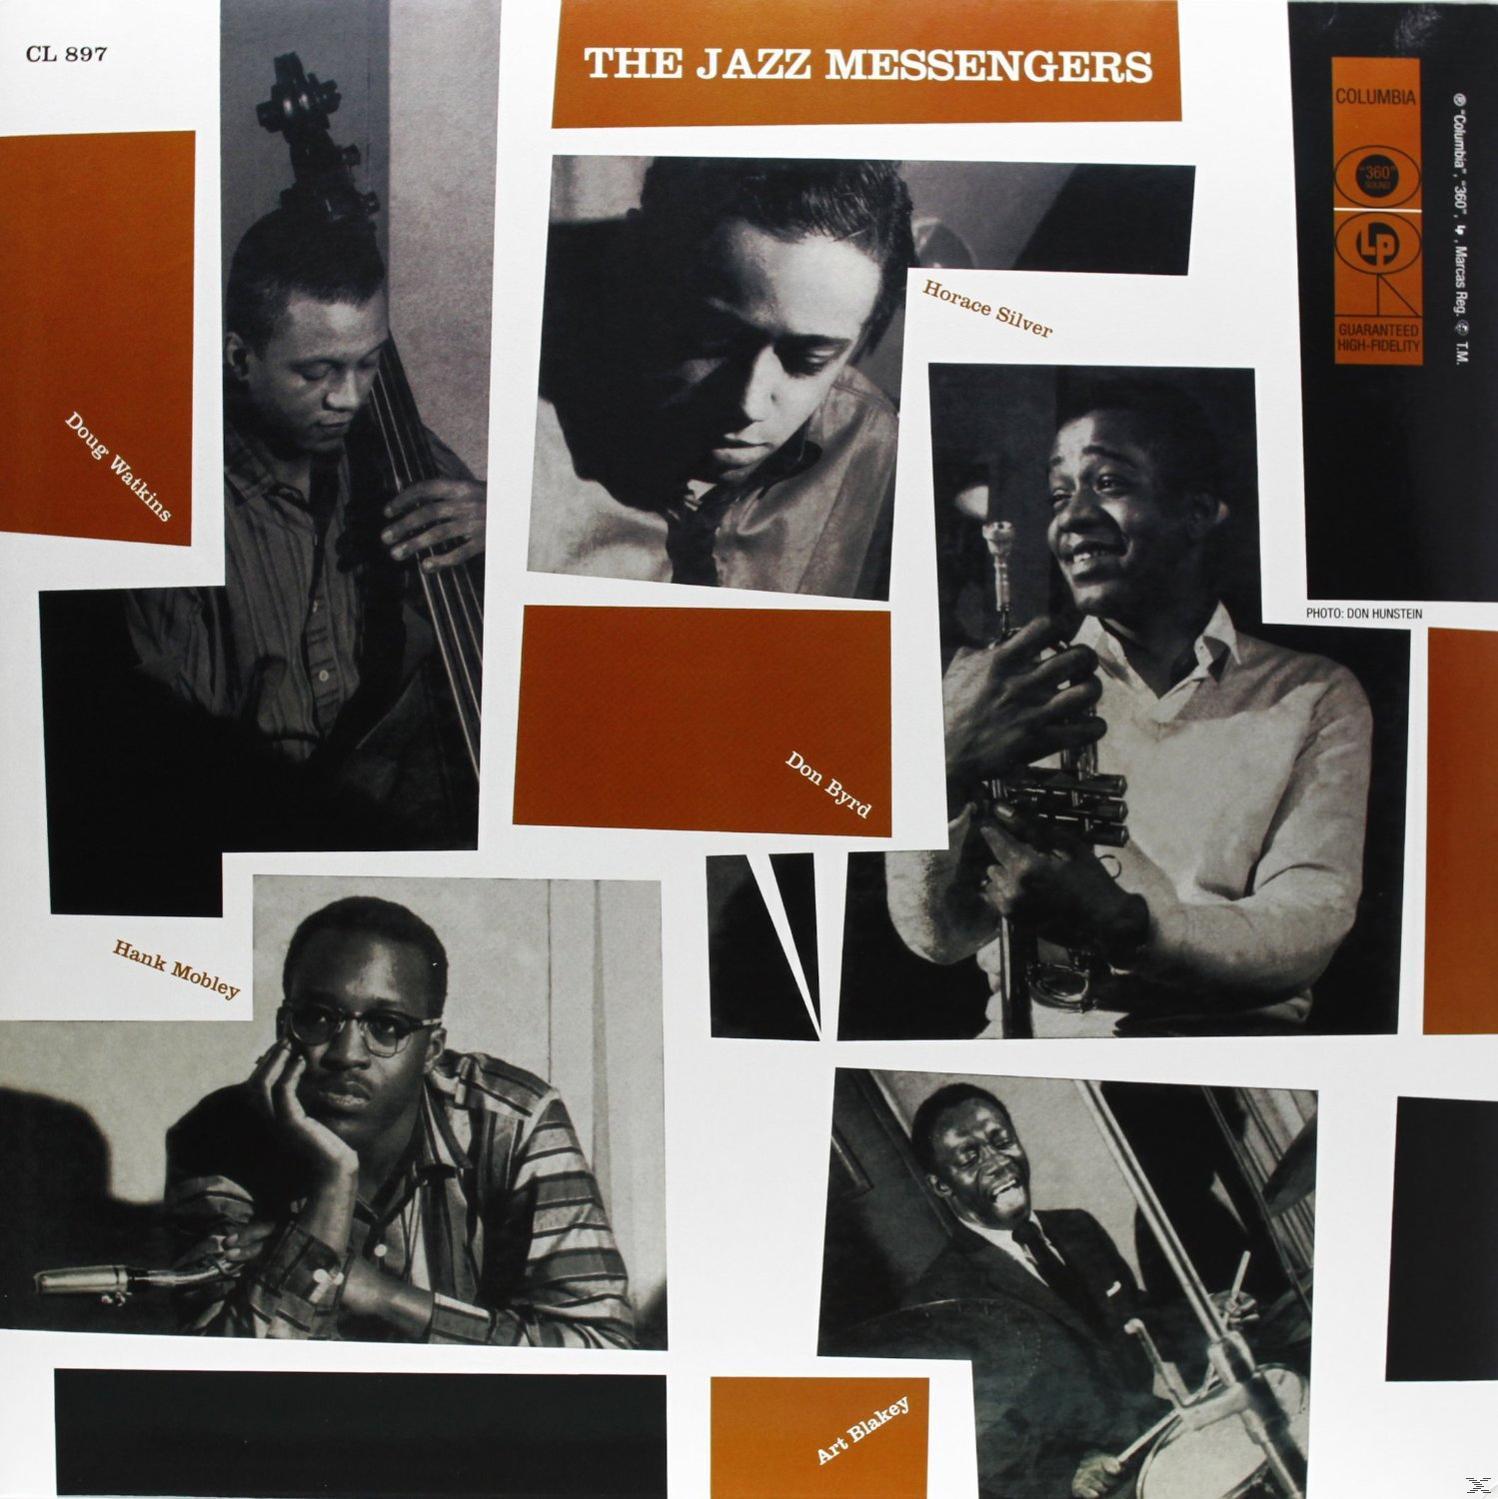 public - the jazz messengers